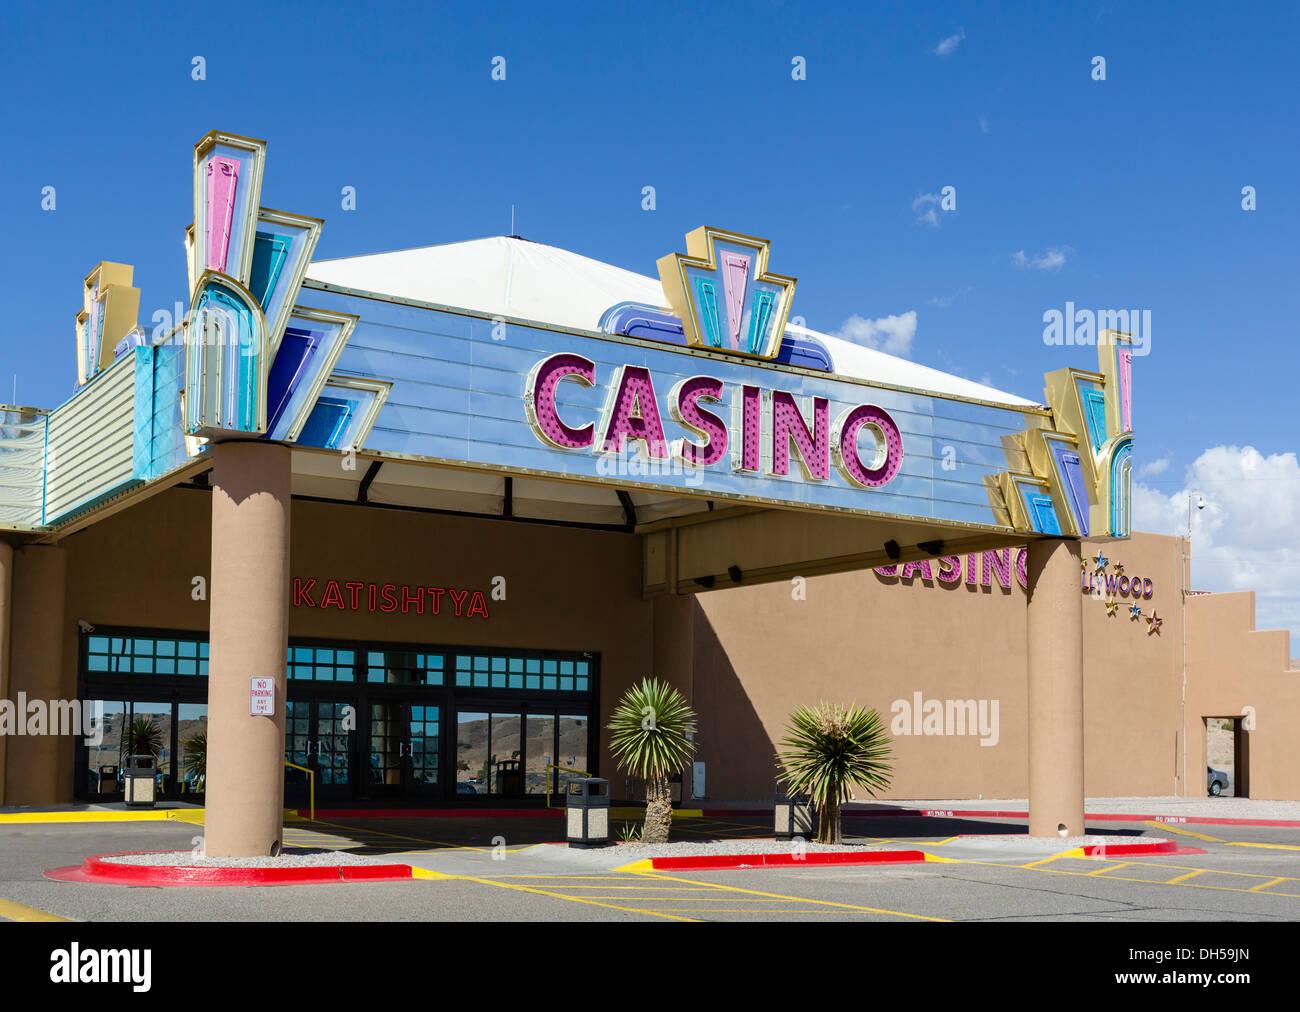 Native American Casino in San Felipe Pueblo, north of Albuquerque, New Mexico, USA - Stock Image